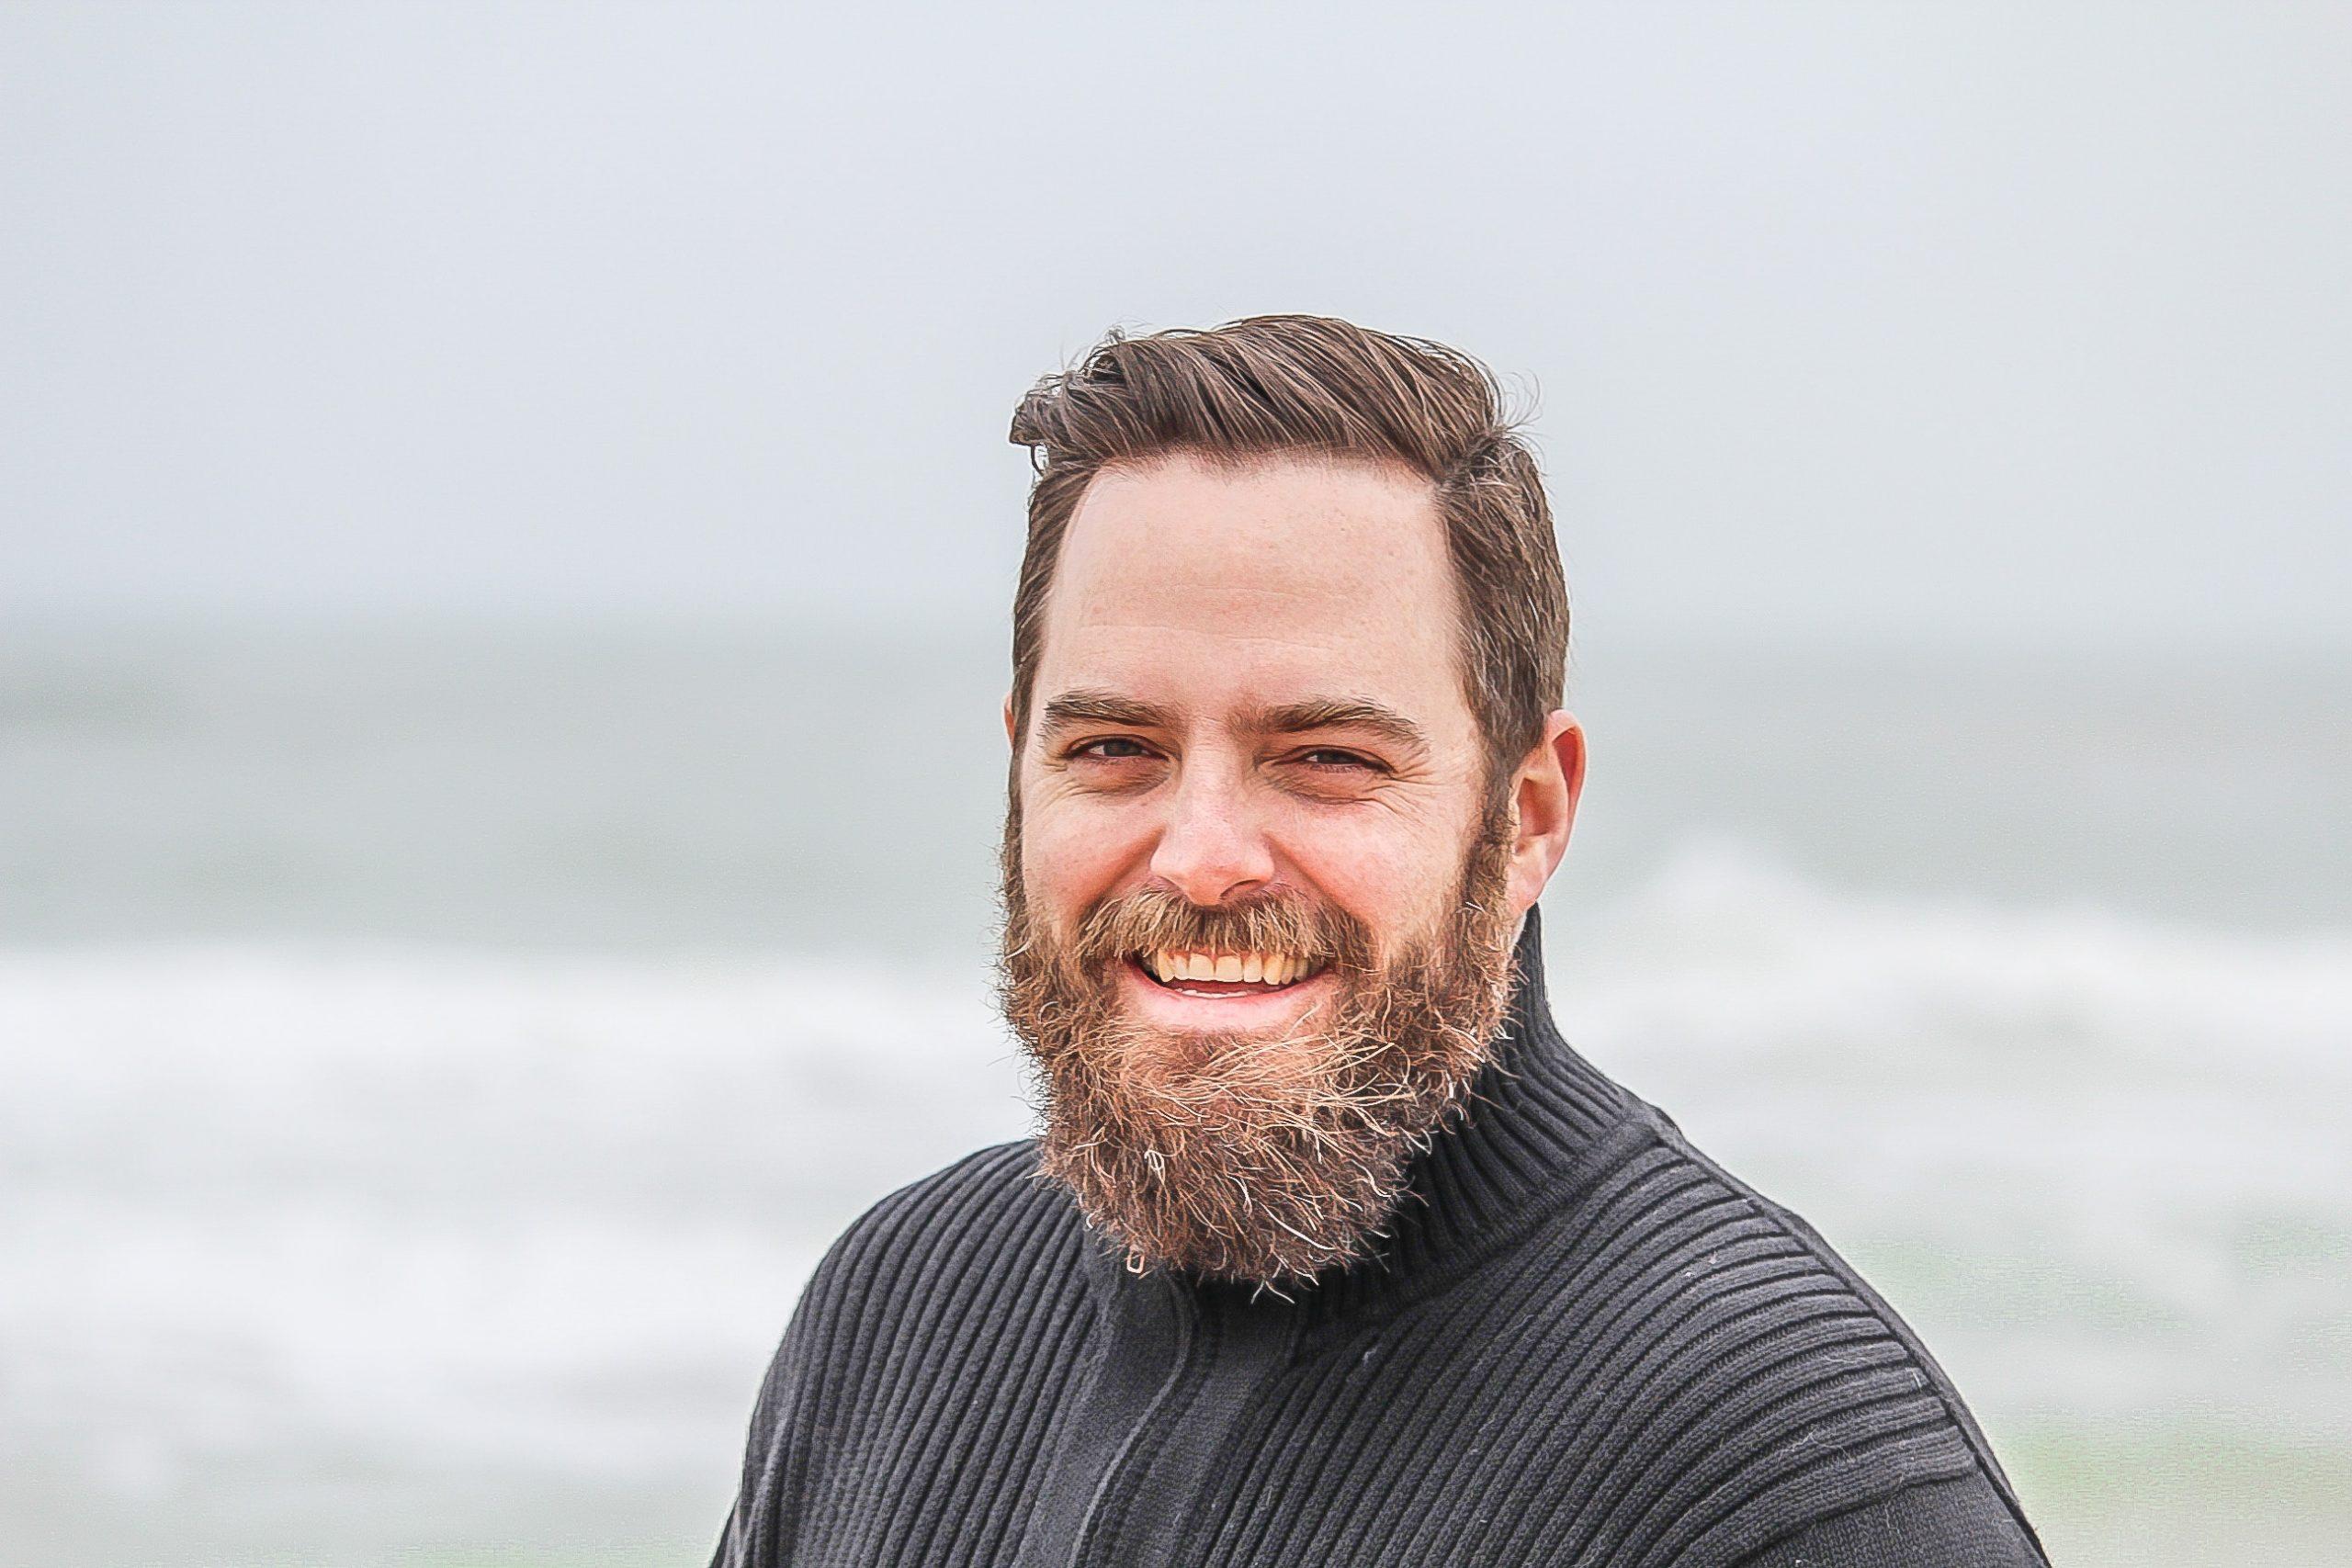 man-wearing-black-zip-up-jacket-near-beach-smiling-at-the-736716